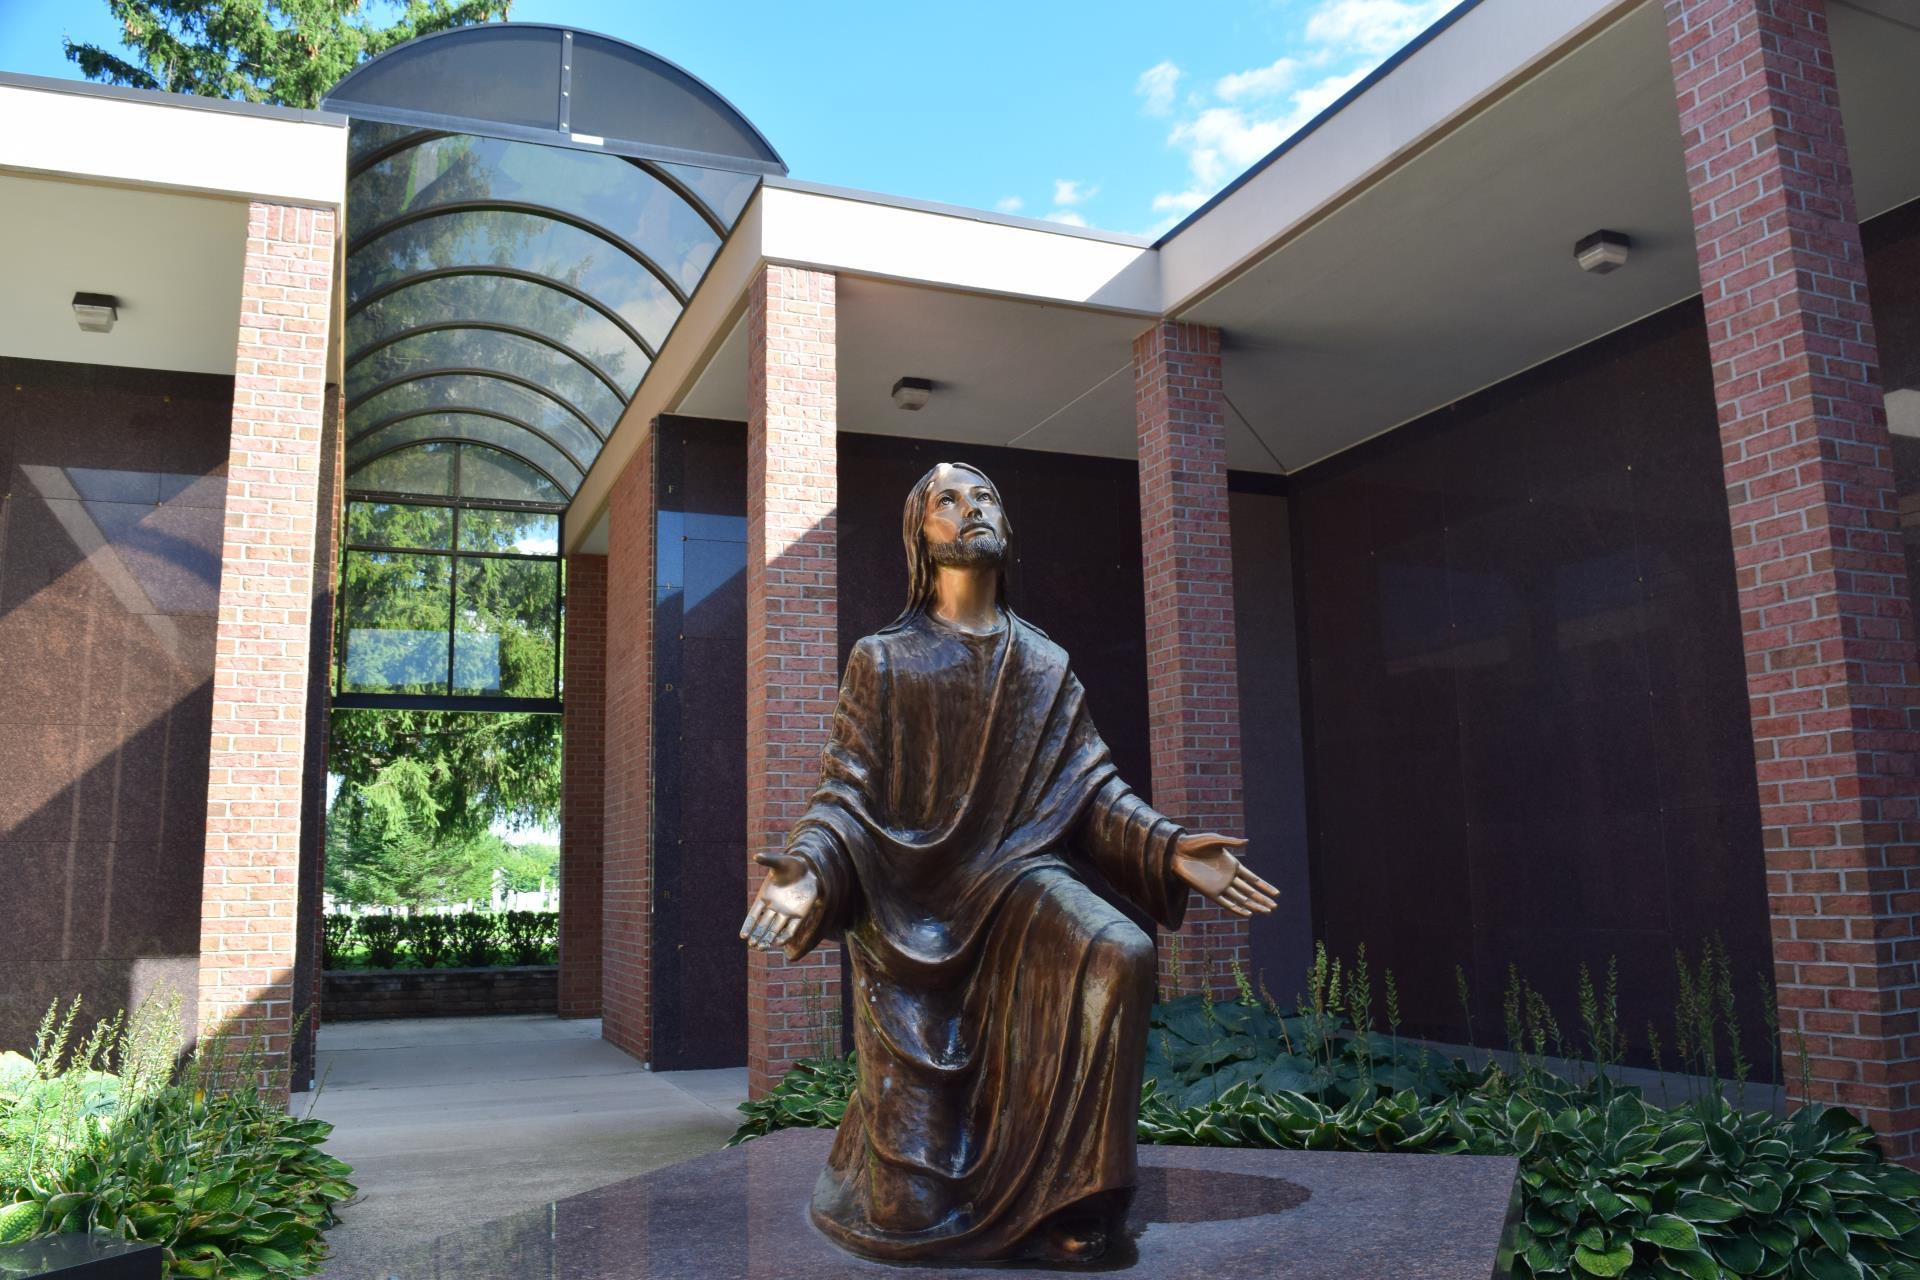 Bronze monument of Christ kneeling